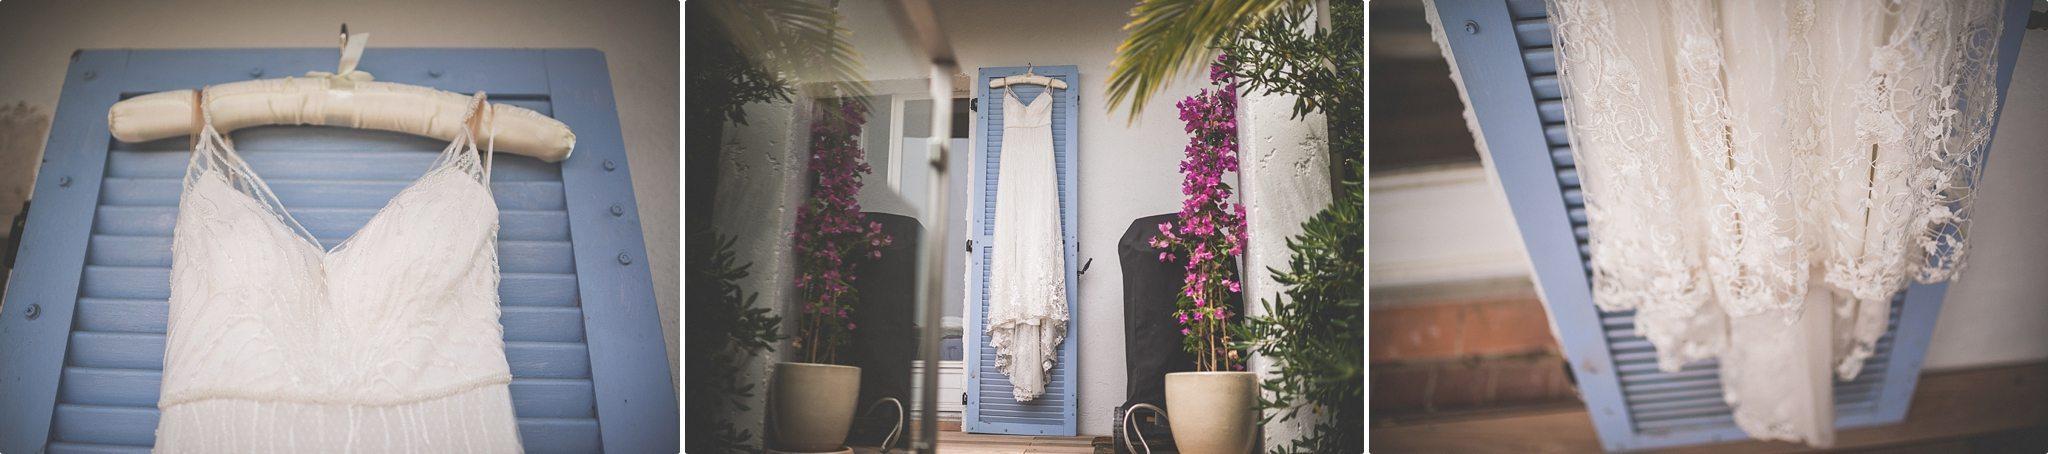 Domaine de la Croix - Wedding - Maria Assia Photography-71